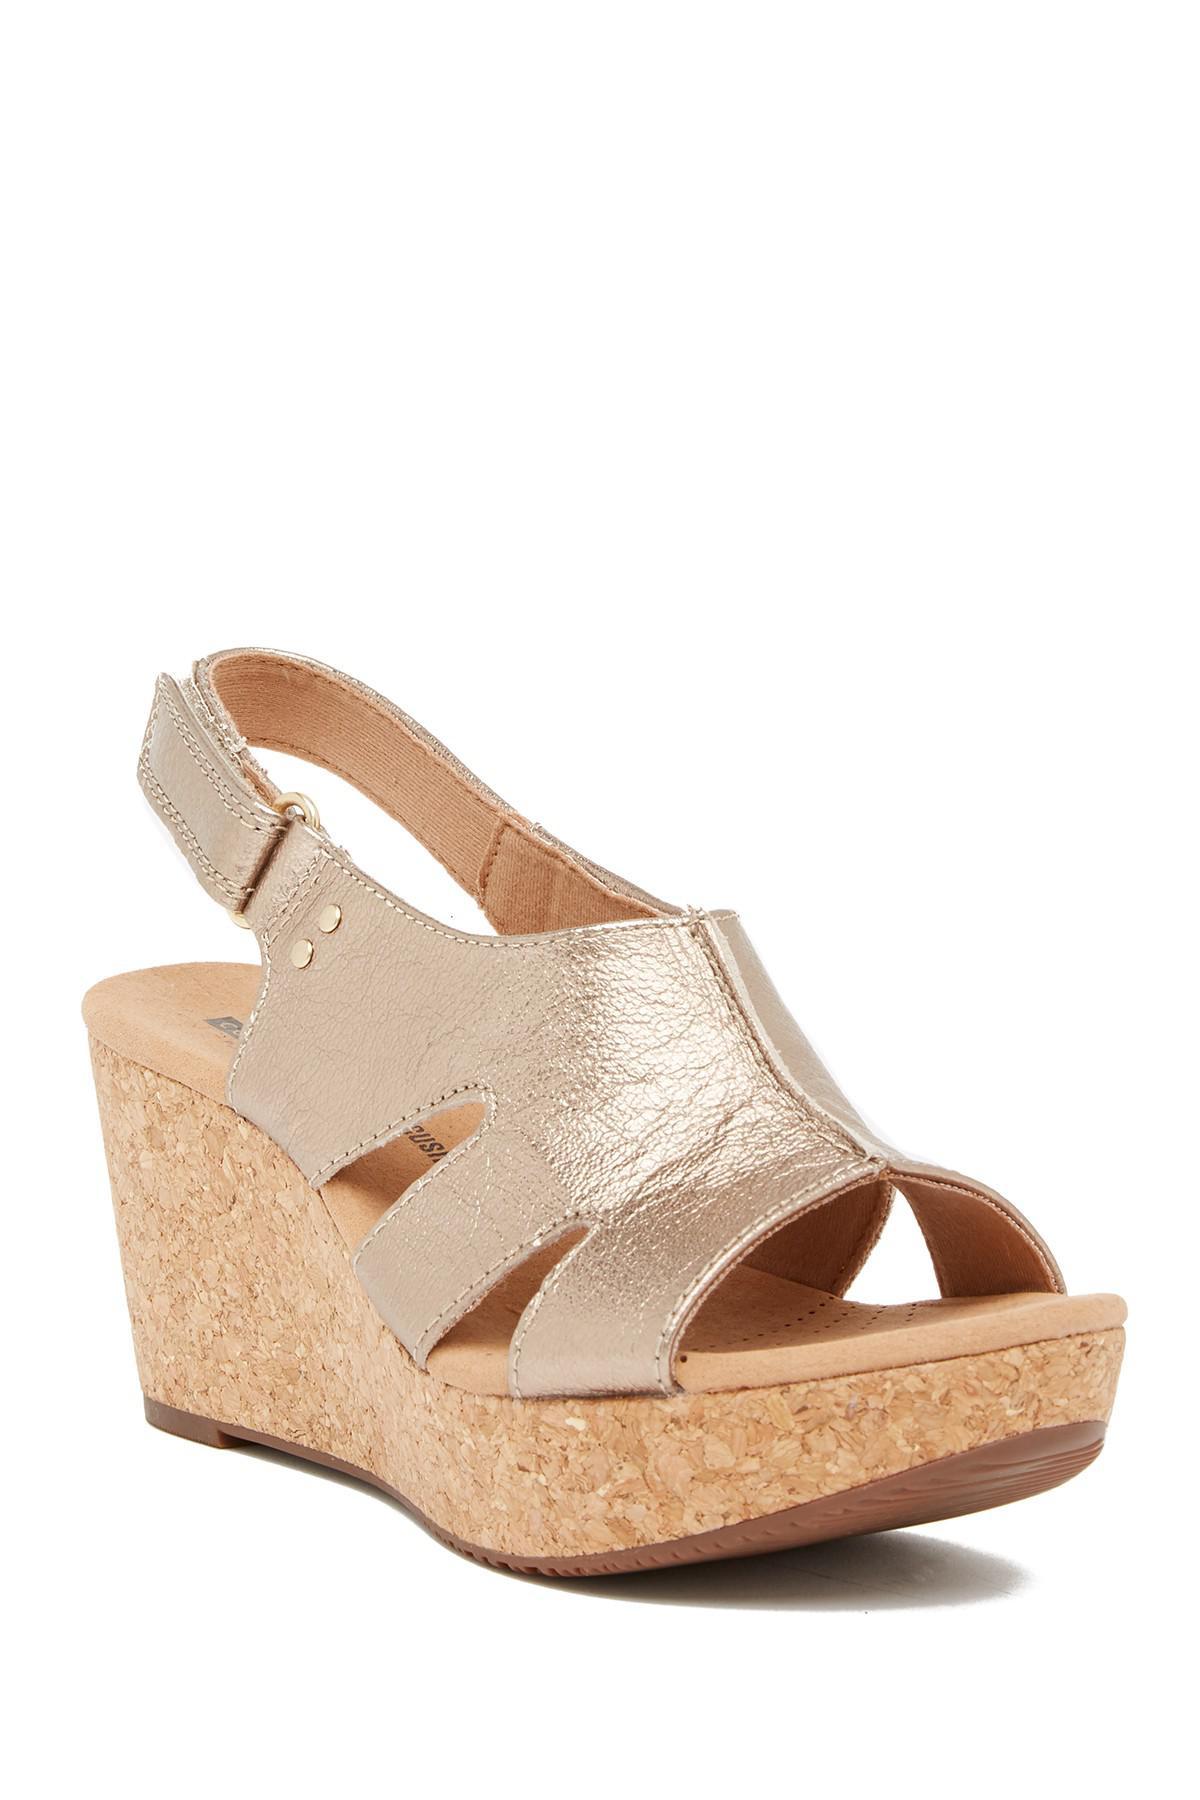 afacaddf4c9 Lyst - Clarks Annadel Bari Leather Platform Wedge Sandal